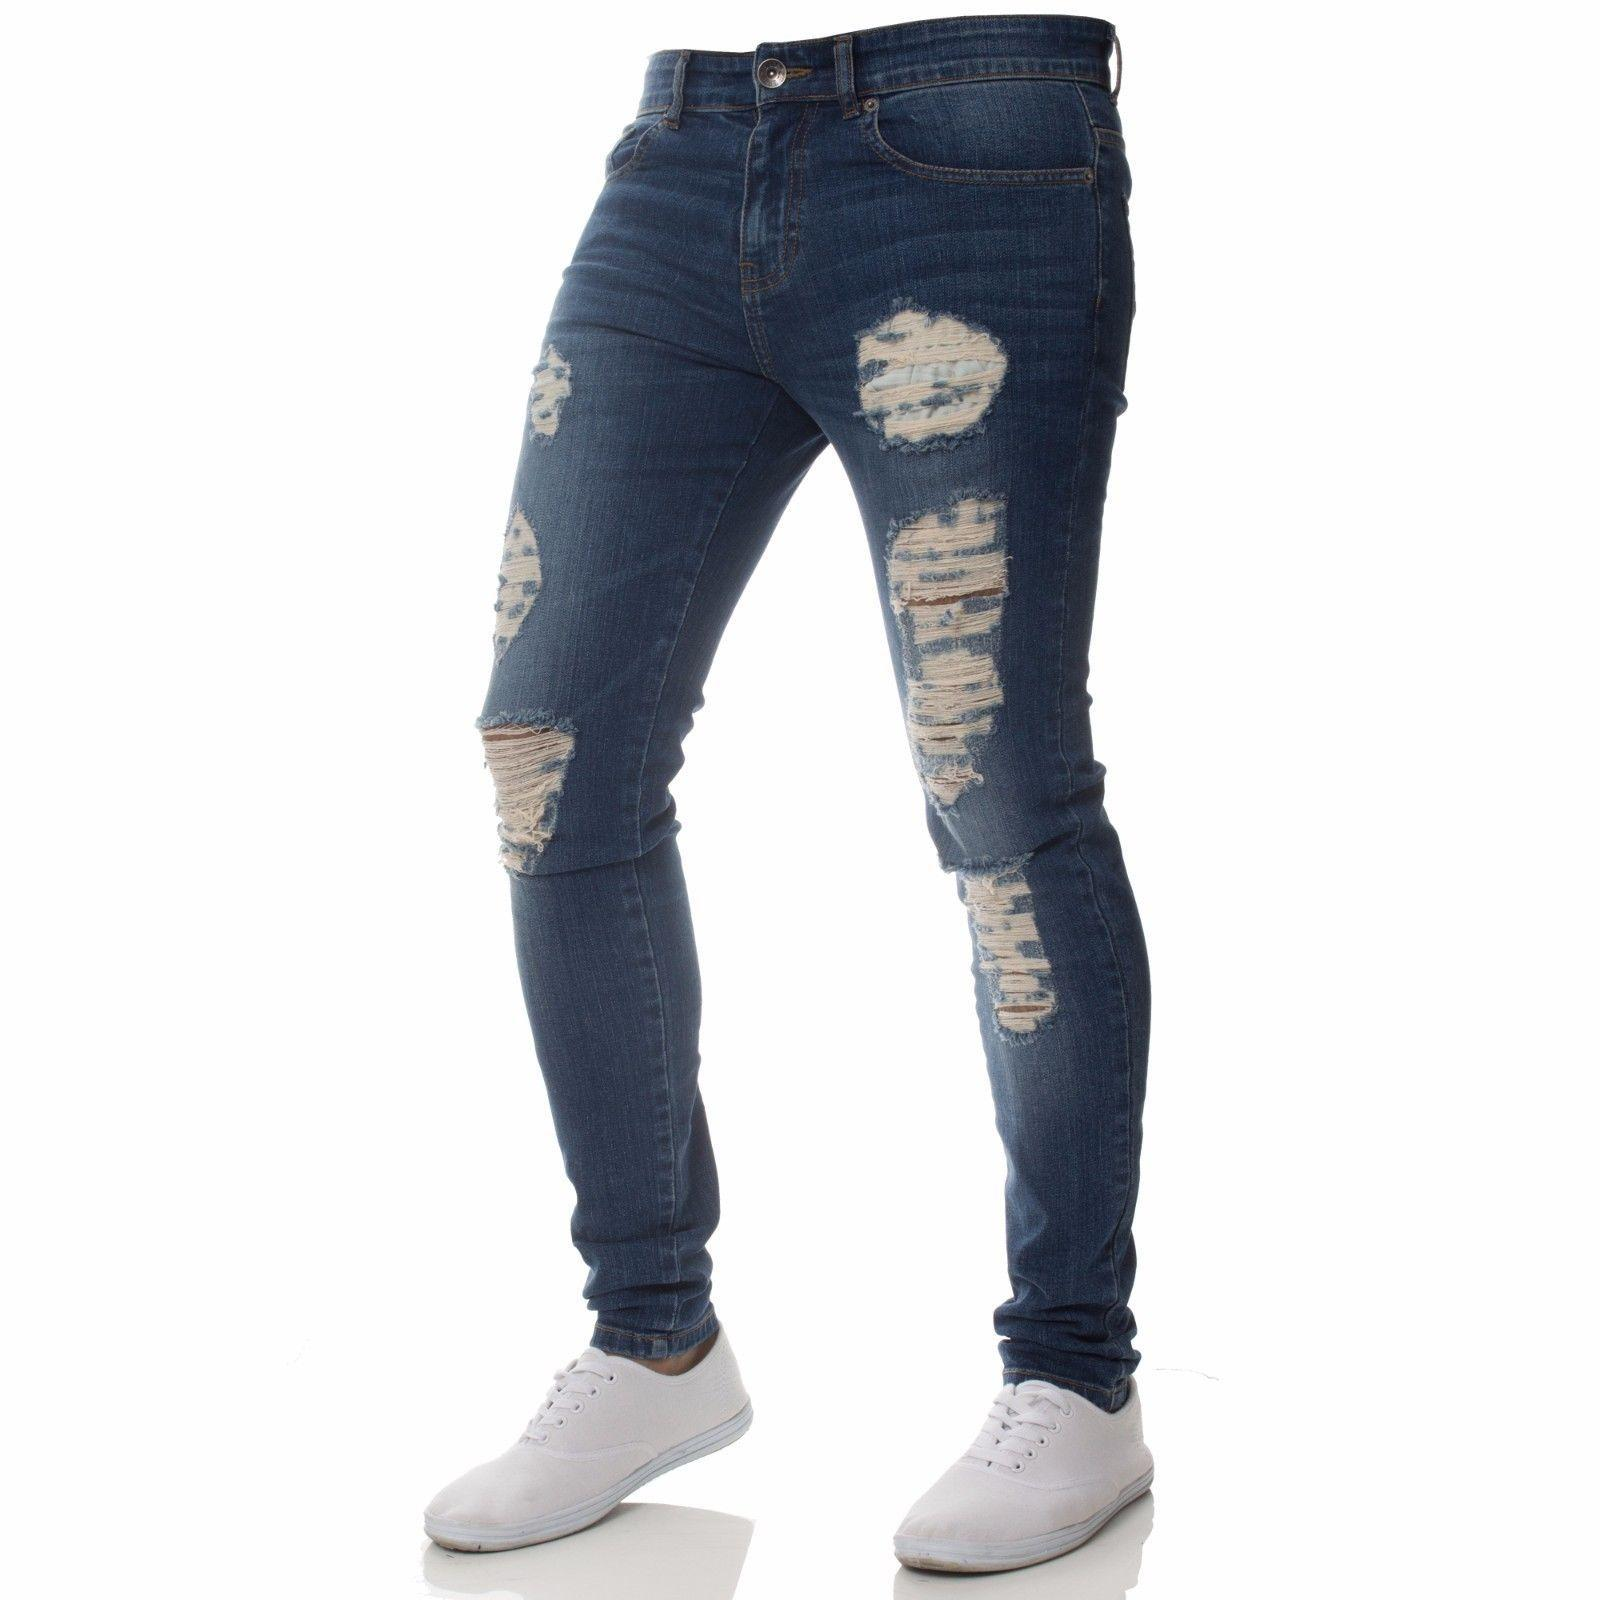 Para Pantalones Hombres 2018 Compre Nuevos Sisibalution qC1IxHSw4 22b4fc06700